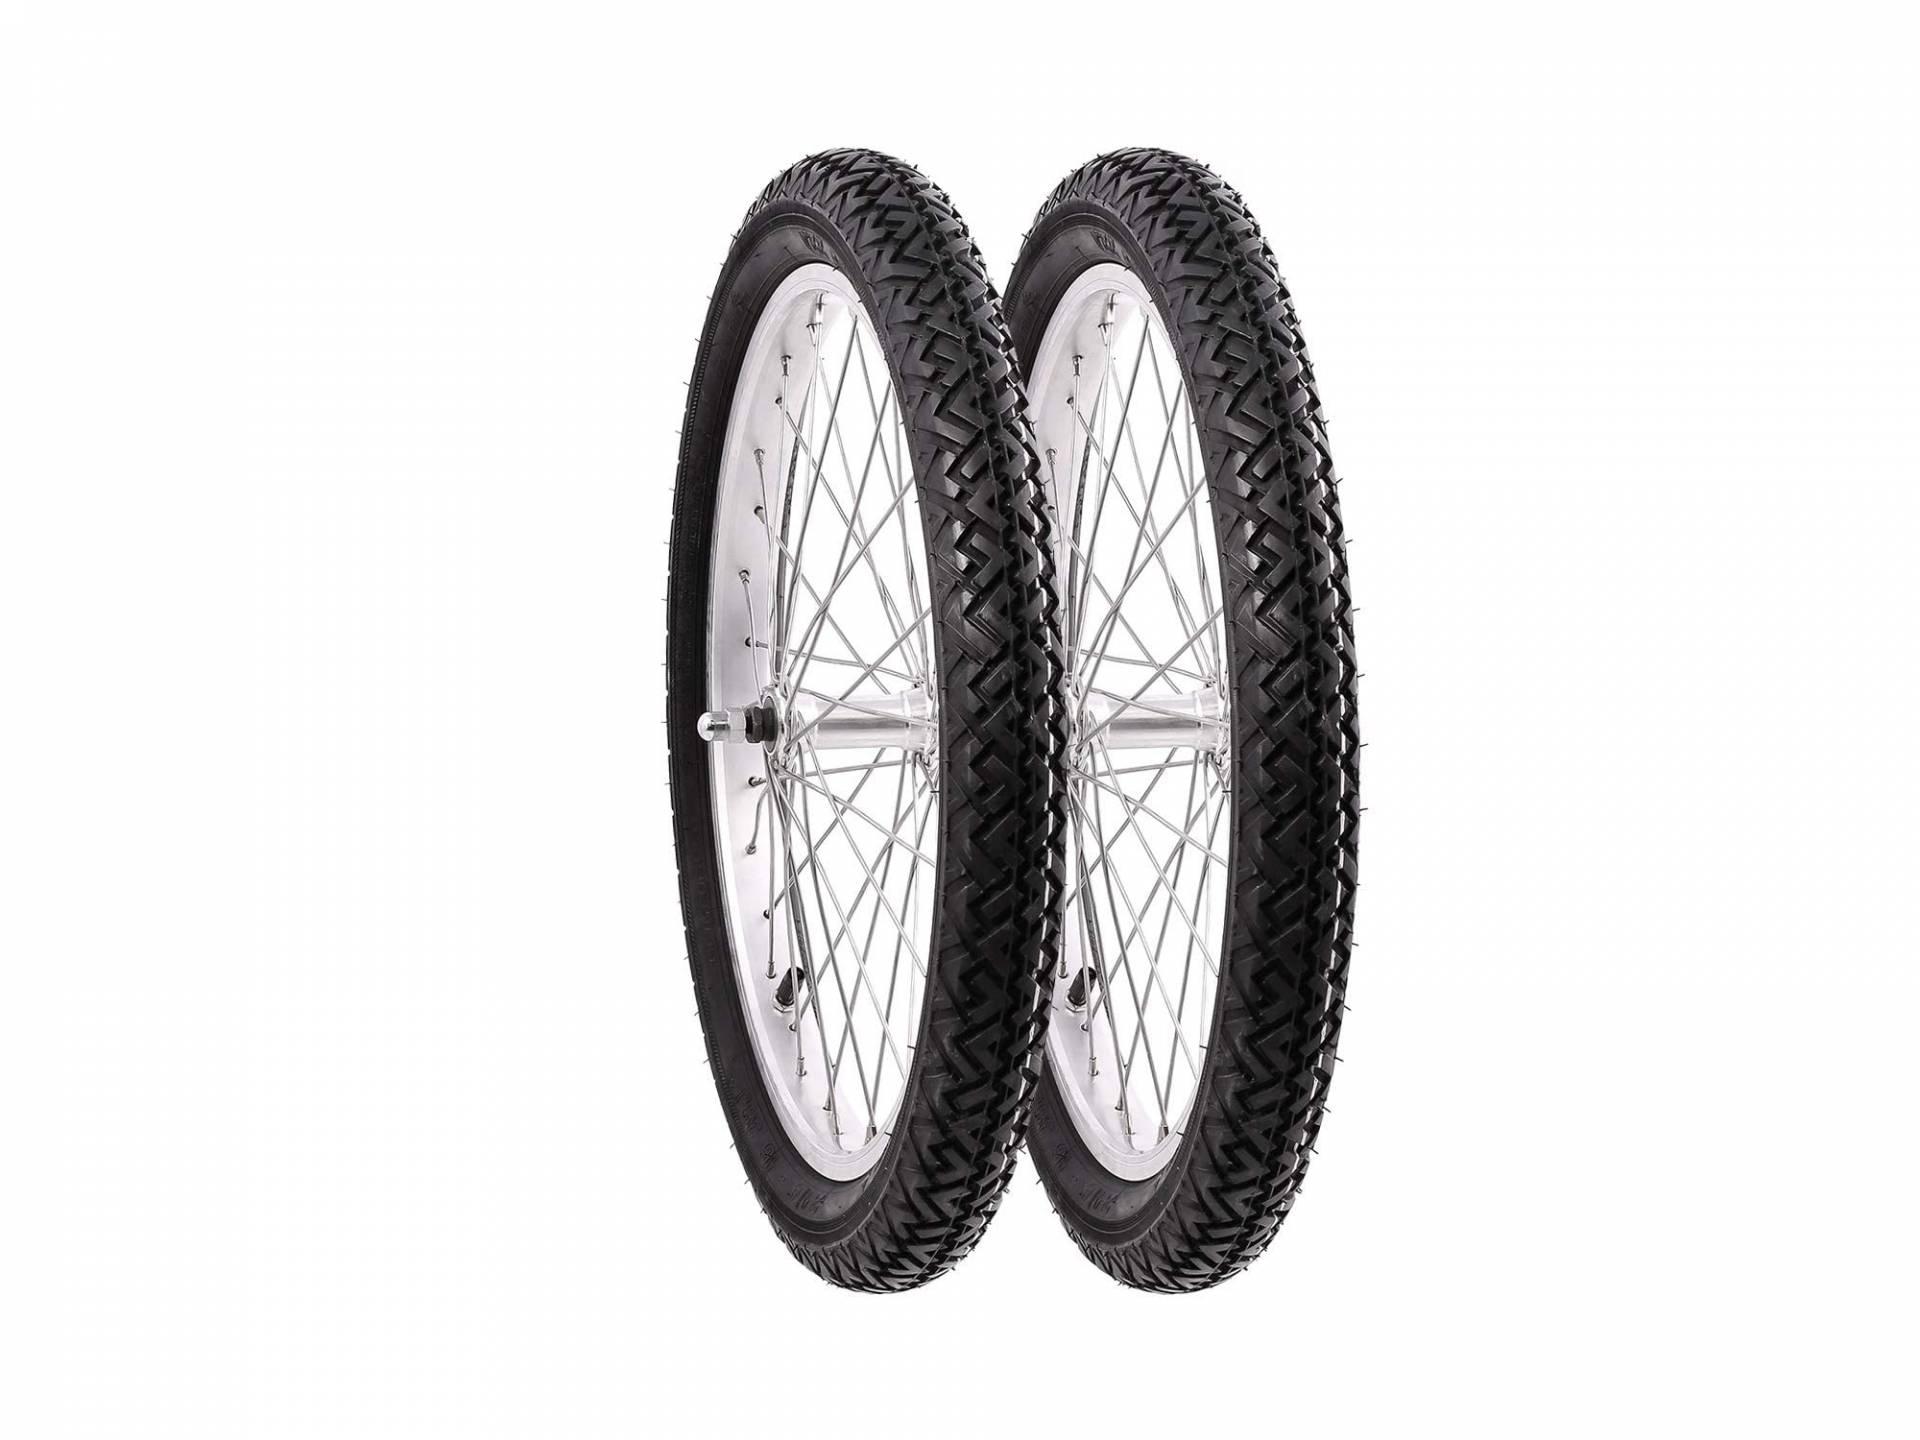 Edelstahlspeichen AKF Komplettrad unmontiert 1,5x16 Alufelge Reifen Vee Rubber 094